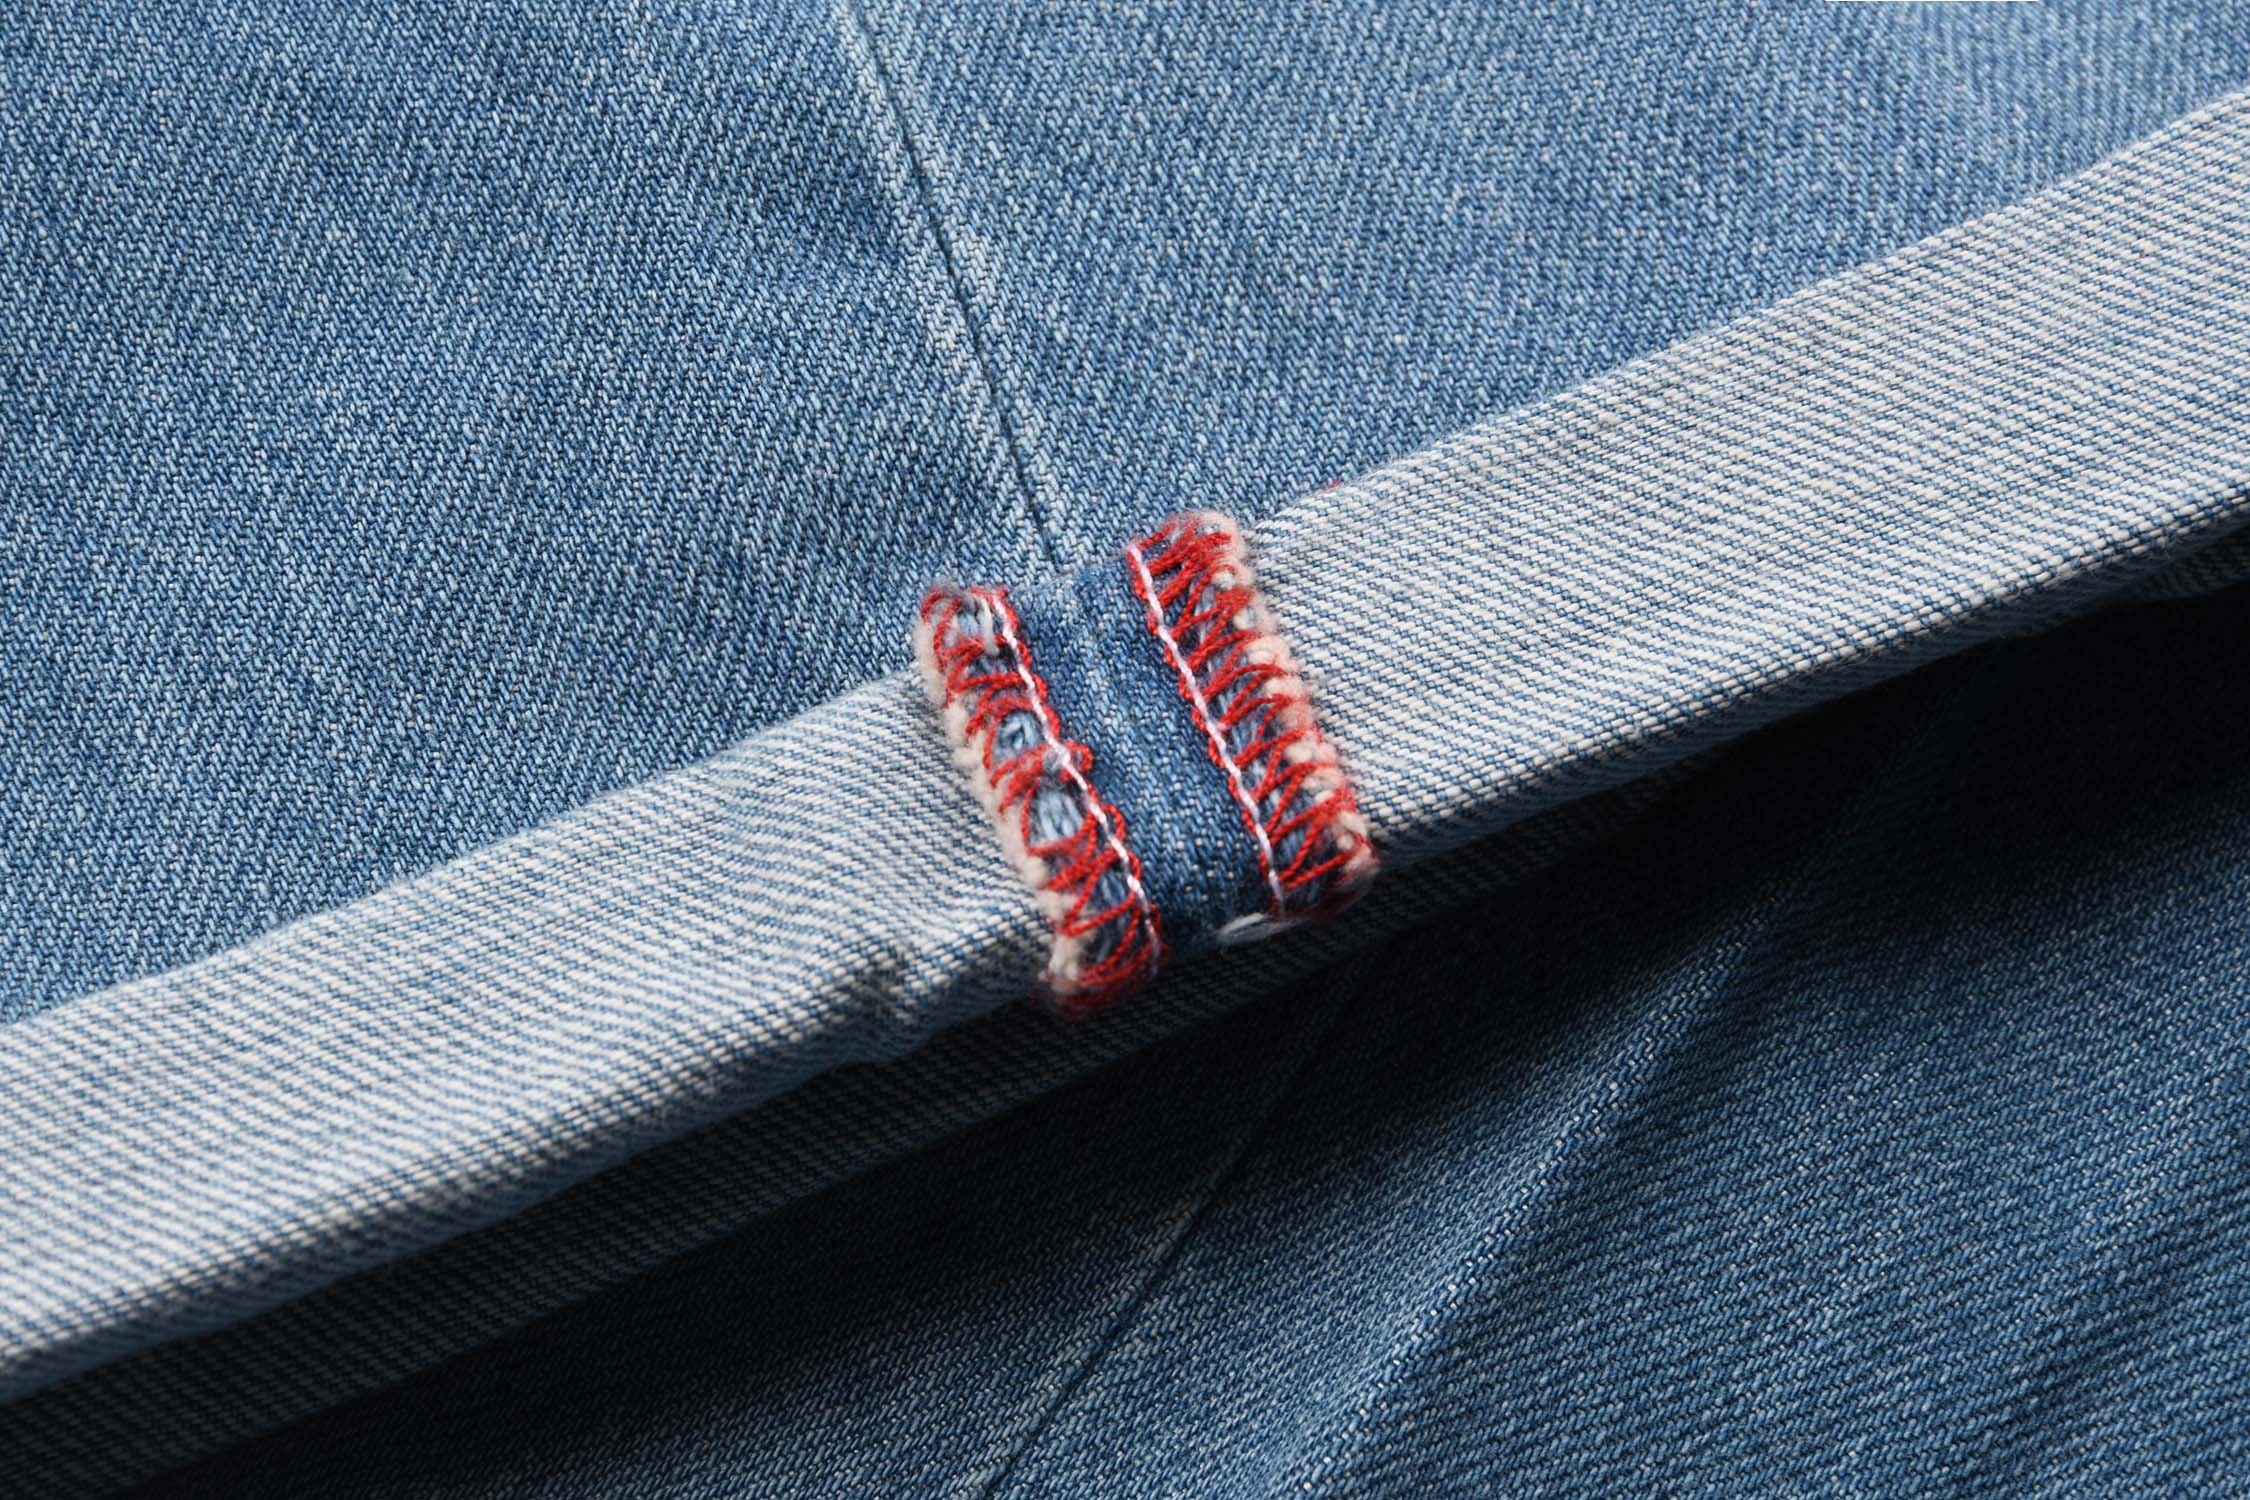 A-Salvarini-Designer-Herren-Jeans-Short-kurze-Sommer-Hose-Jeansshorts-Bermuda Indexbild 8